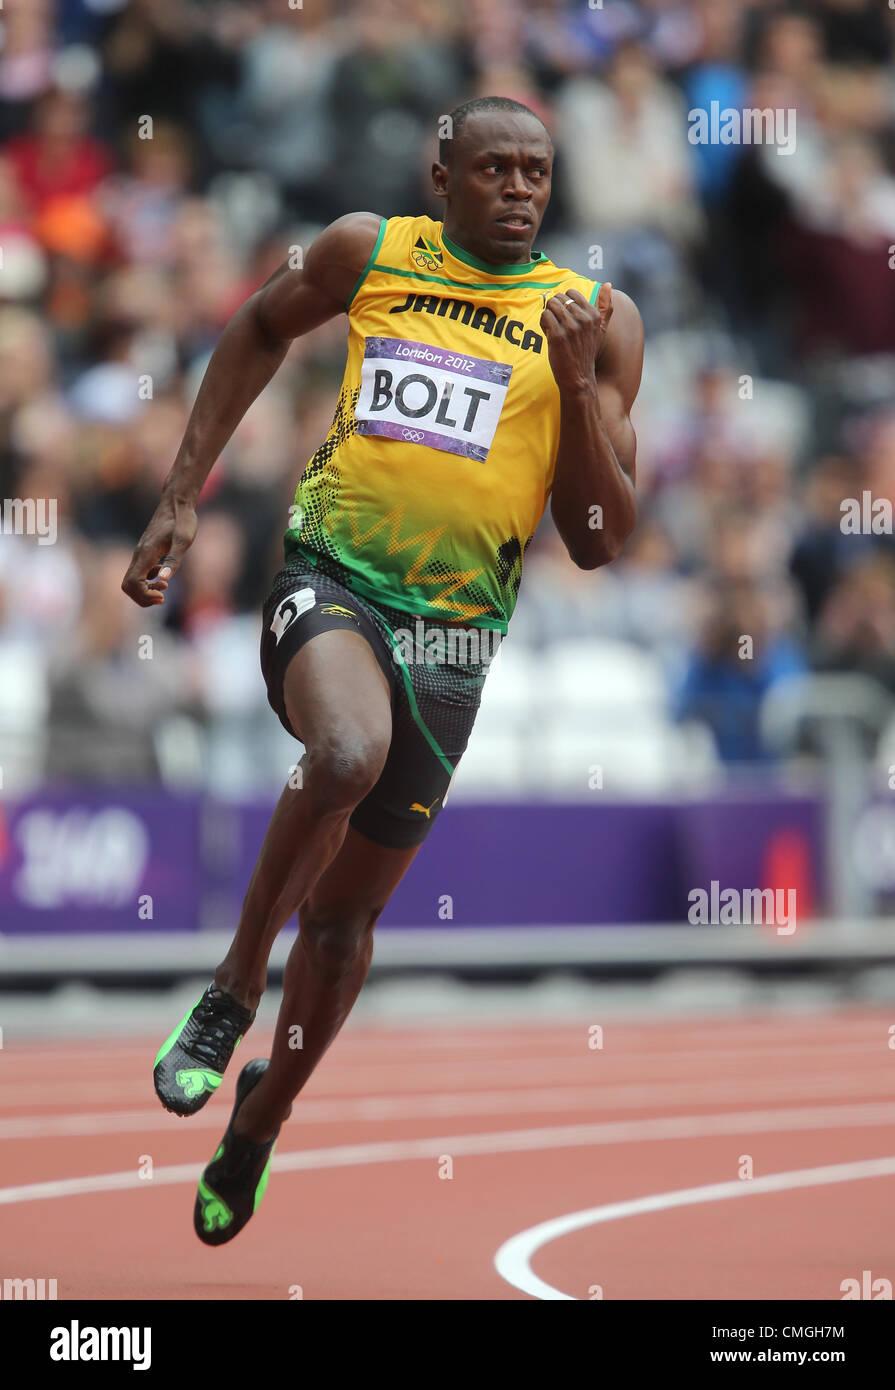 7th Aug 2012. USAIN BOLT JAMAICA LONDON 2012 OLYMPIC GAMES ...